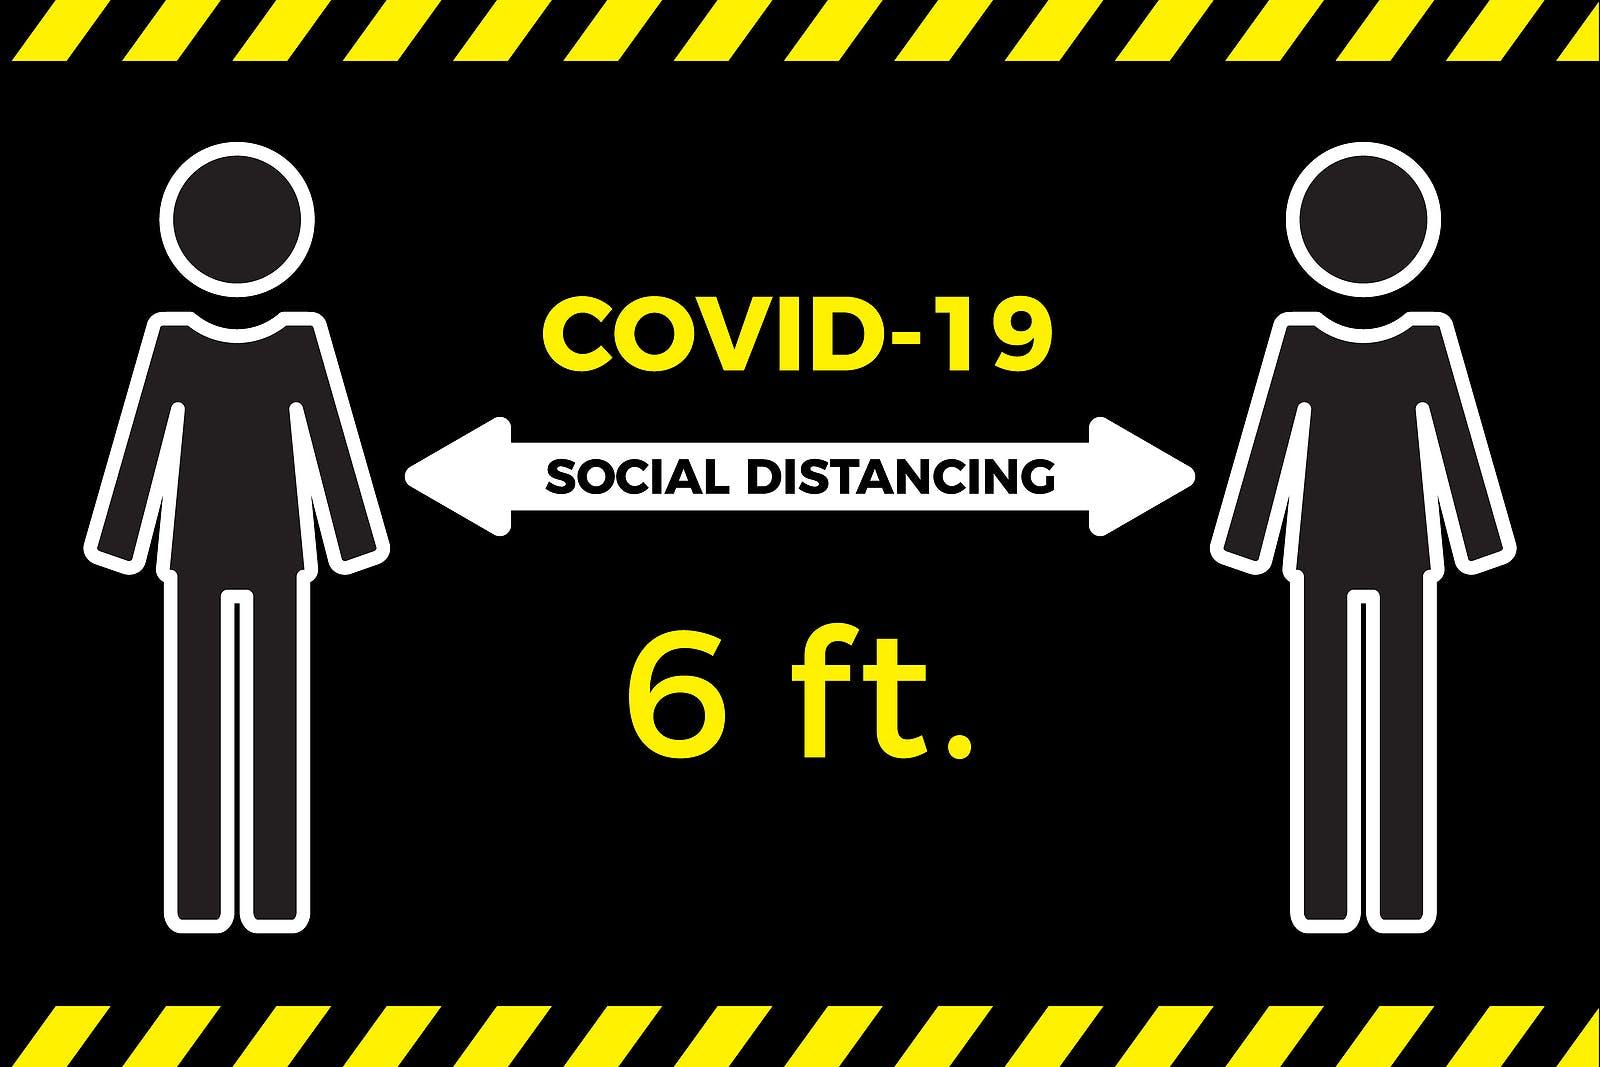 Coronavirus COVID-19 virus social distancing concept. Stay six feet apart. Flat icon vector illustration